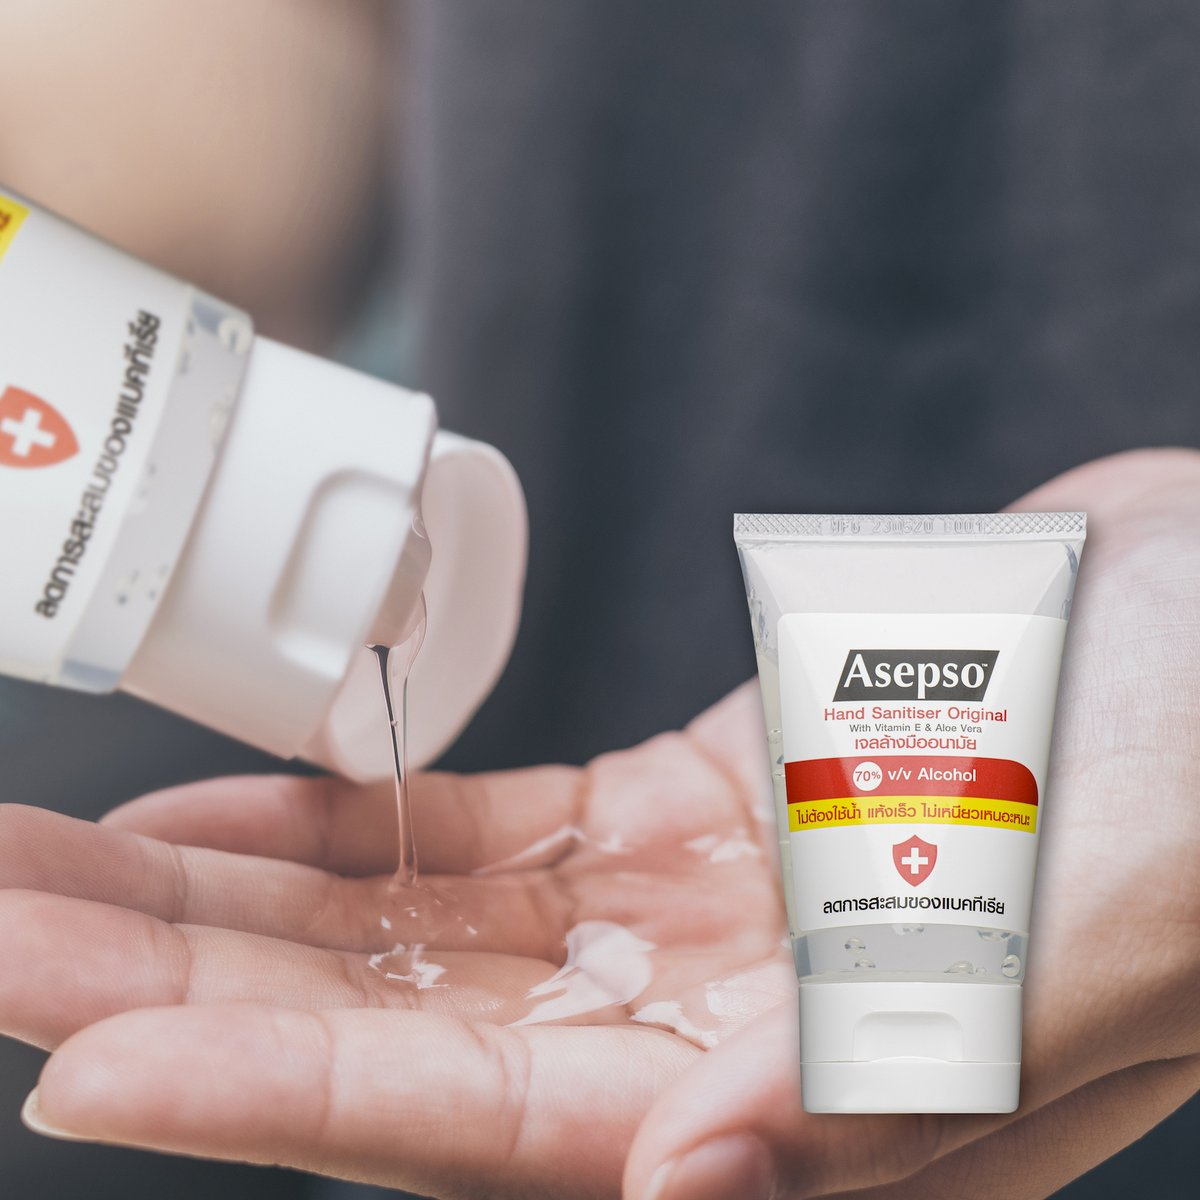 📸 NEW #Asepso Hand Sanitiser Original 🙌 https://t.co/HiSfLz4qUf